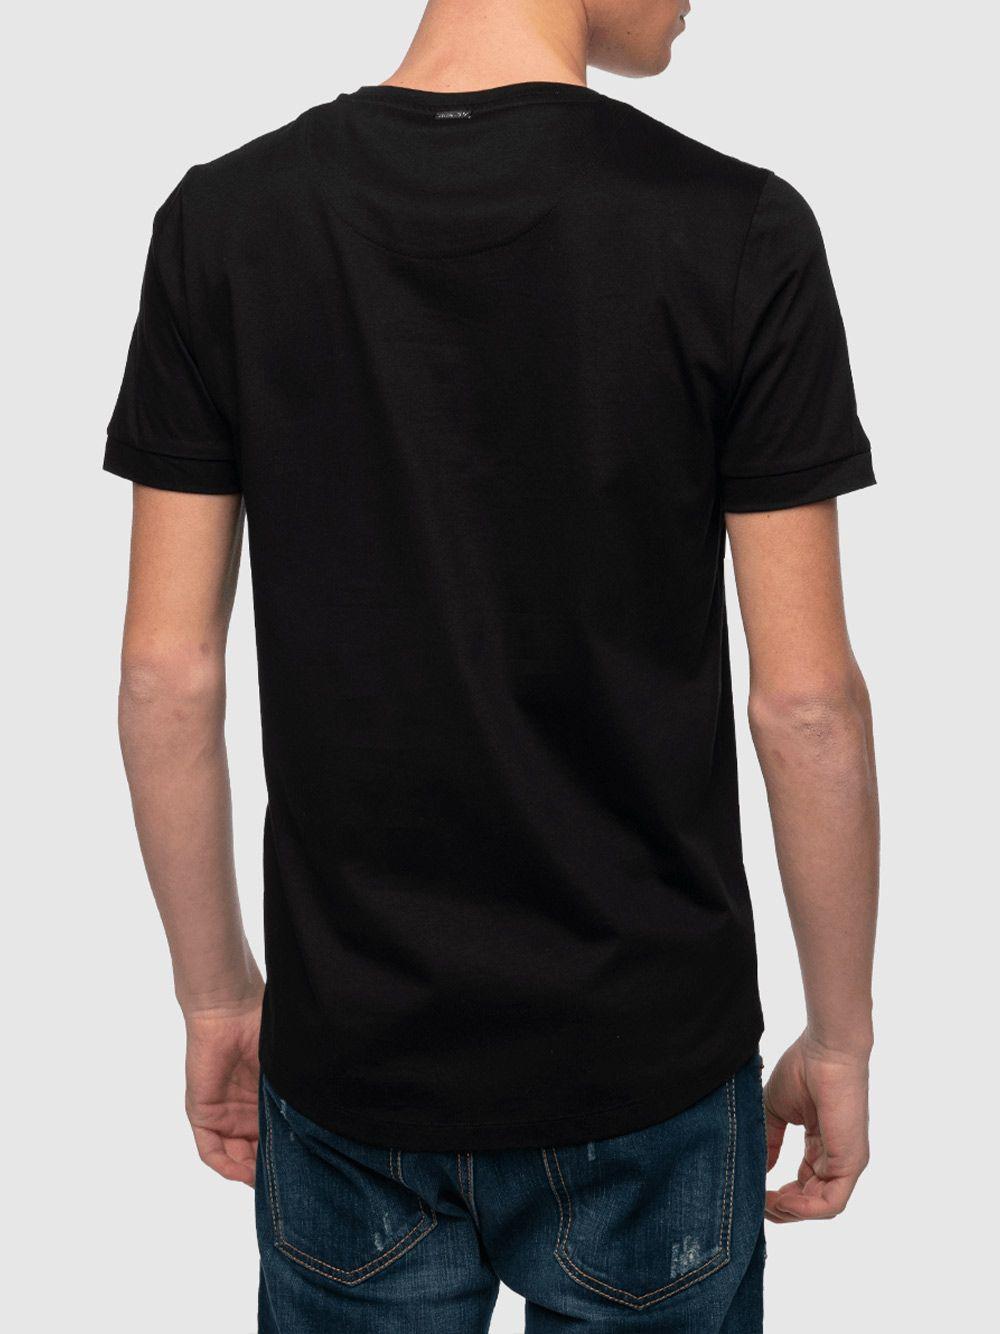 Inimigo Block T-Shirt   Inimigo